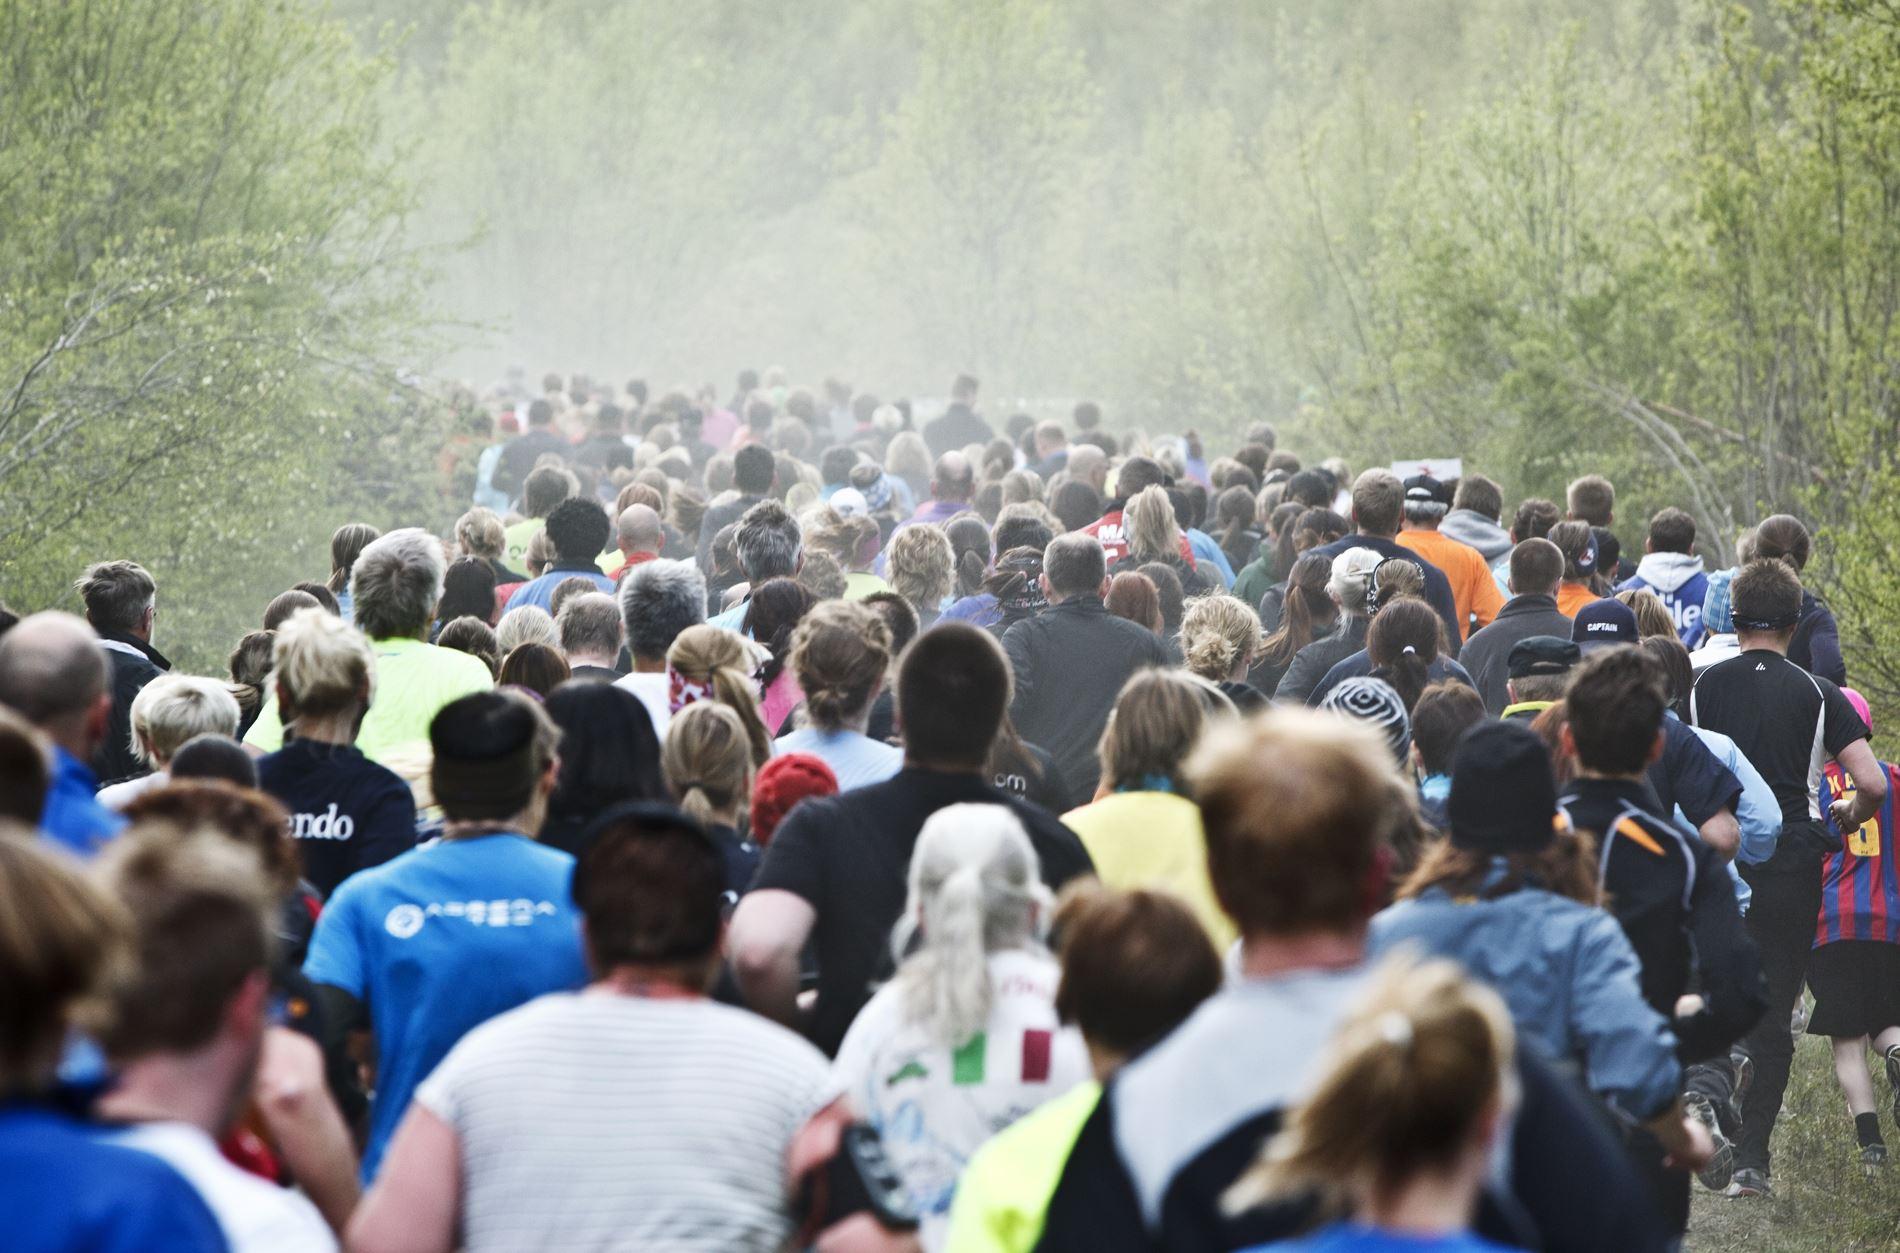 Henrik Olofsson, Blodomloppet